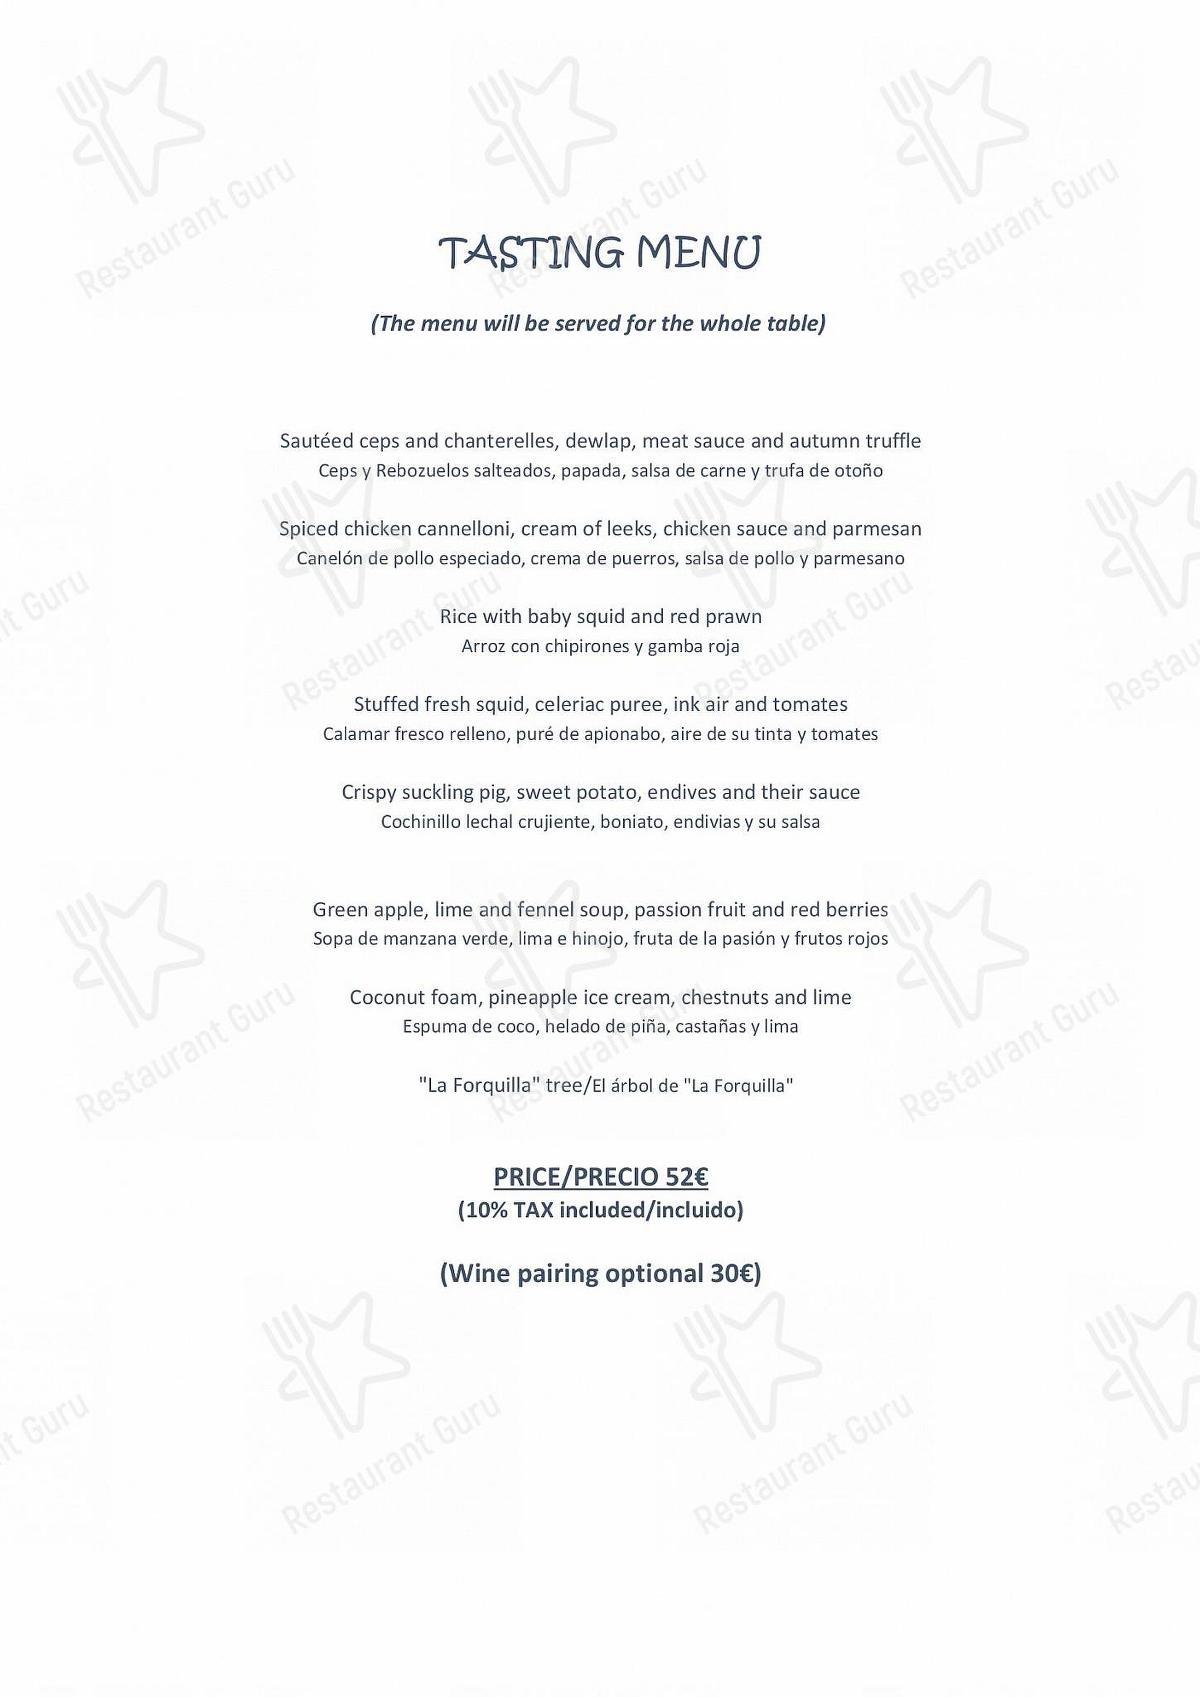 Carta de La Forquilla Restaurant restaurante